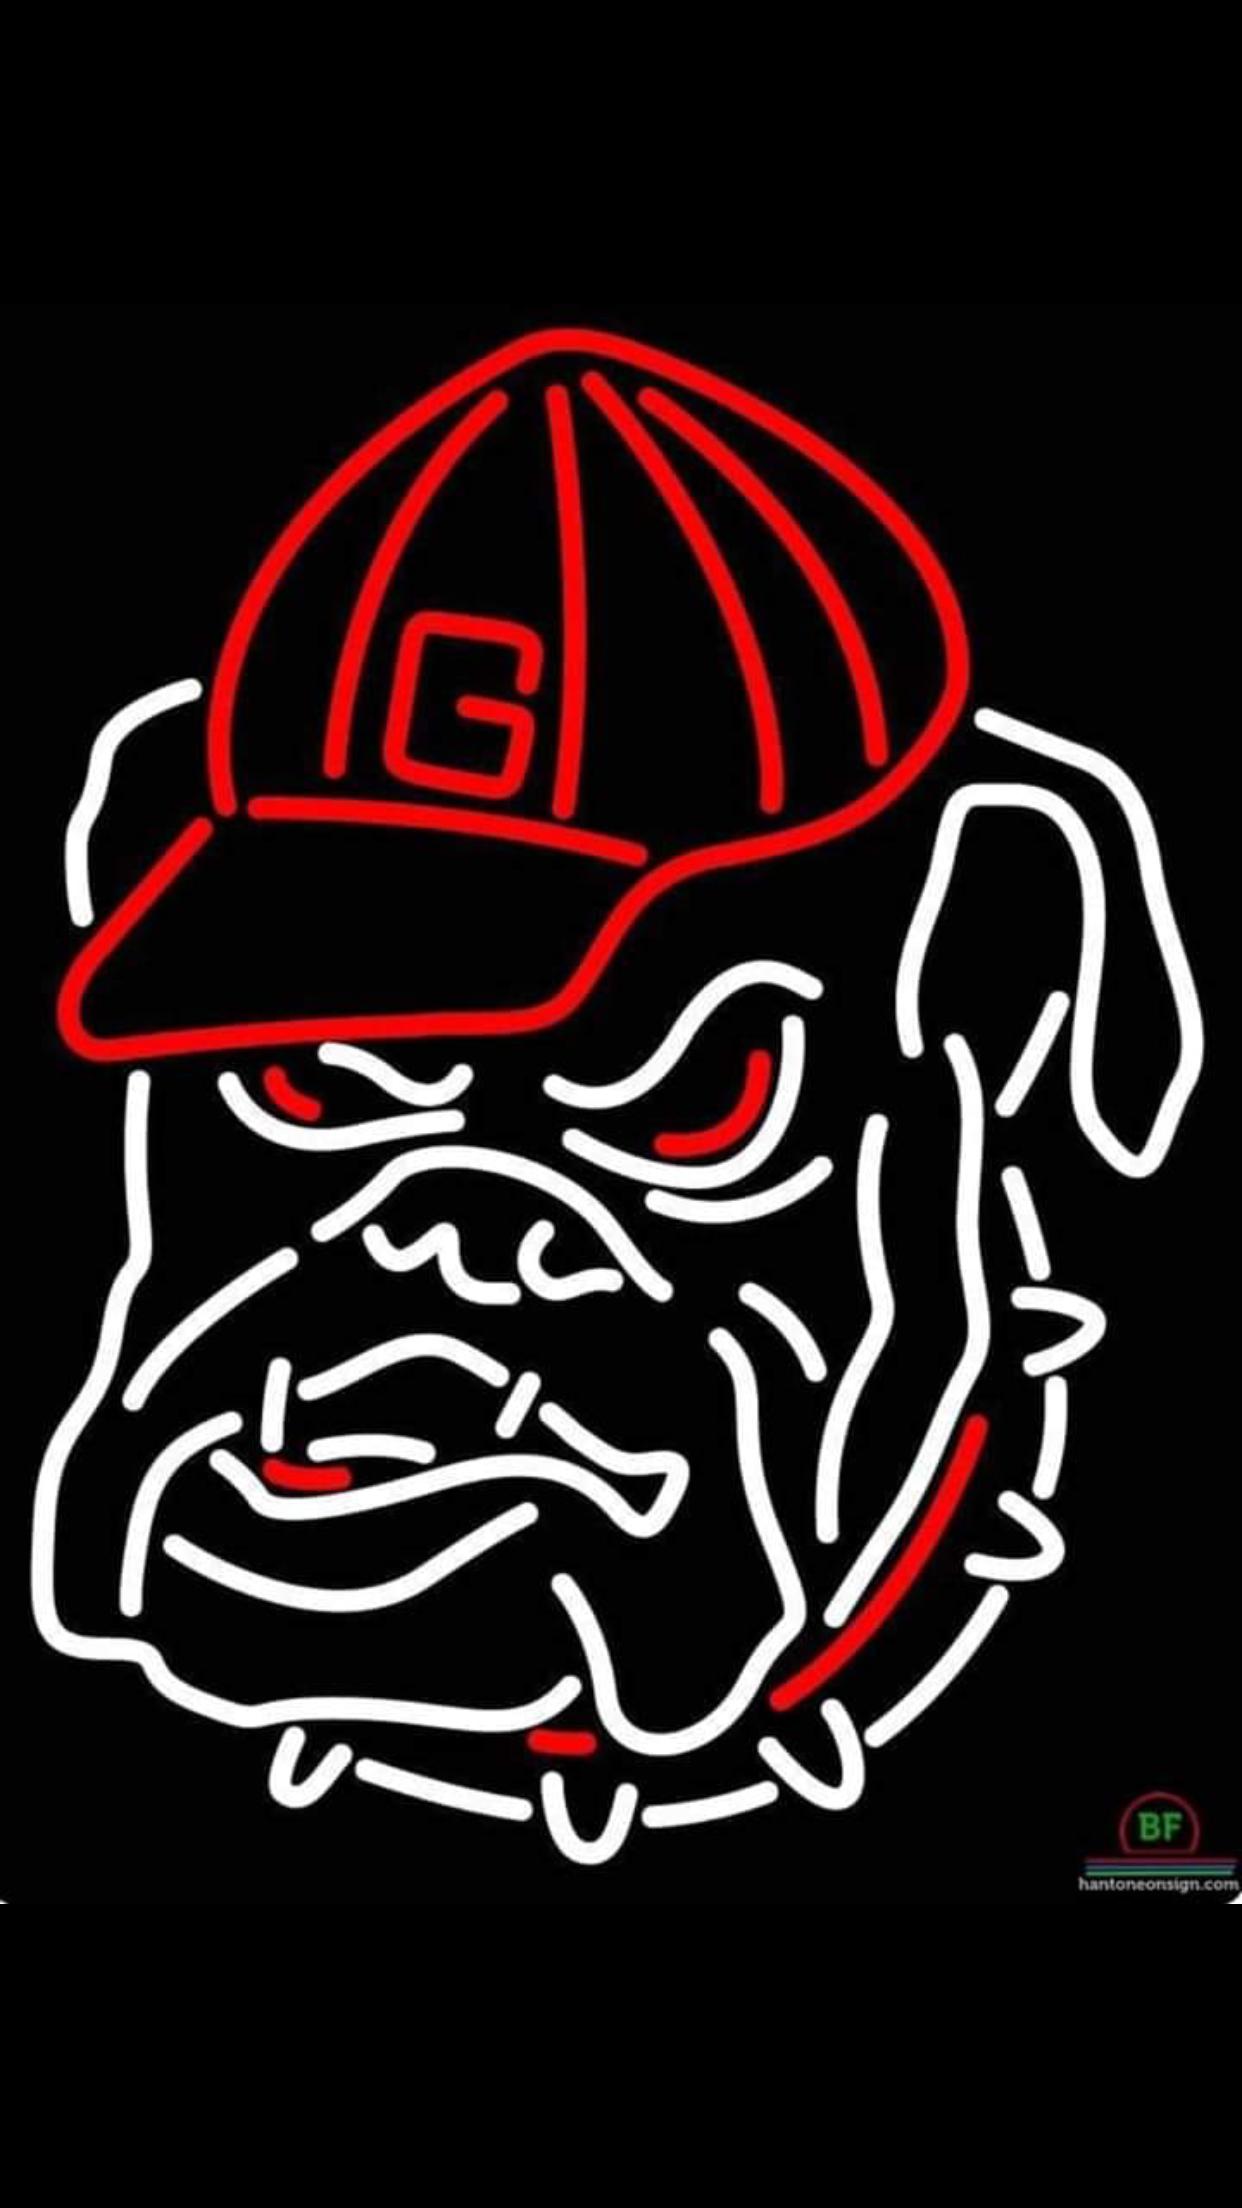 Pin By Elizabeth Randolph On How Bout Them Dawgs In 2020 Georgia Bulldogs Georgia Bulldogs Football Georgia Dawgs